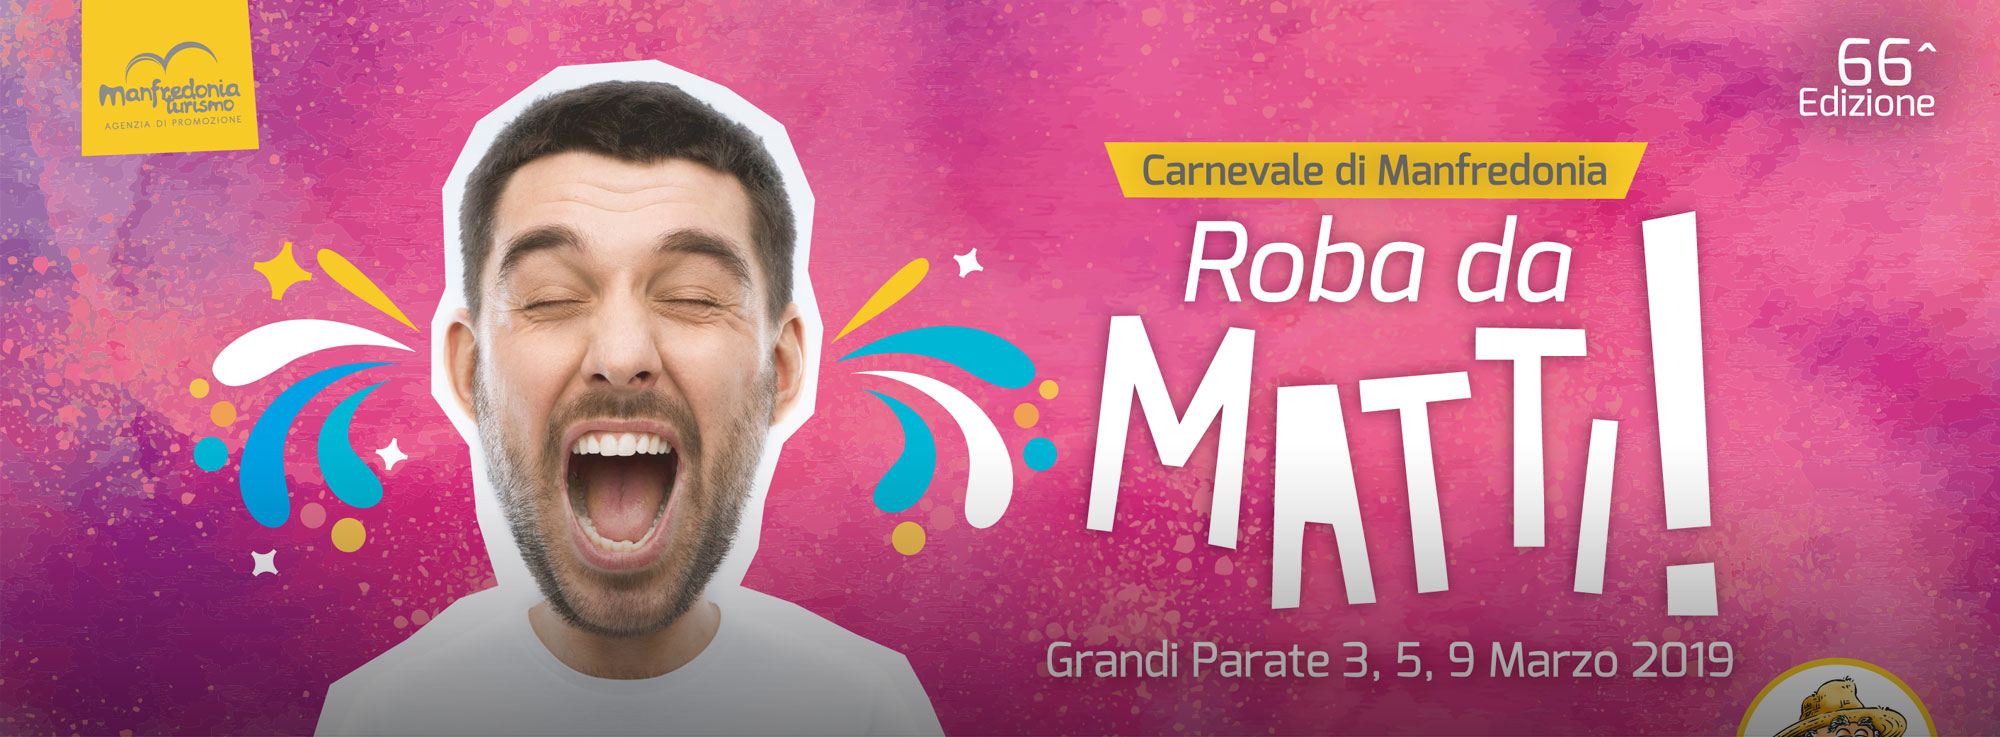 Manfredonia: 66° Carnevale di Manfredonia